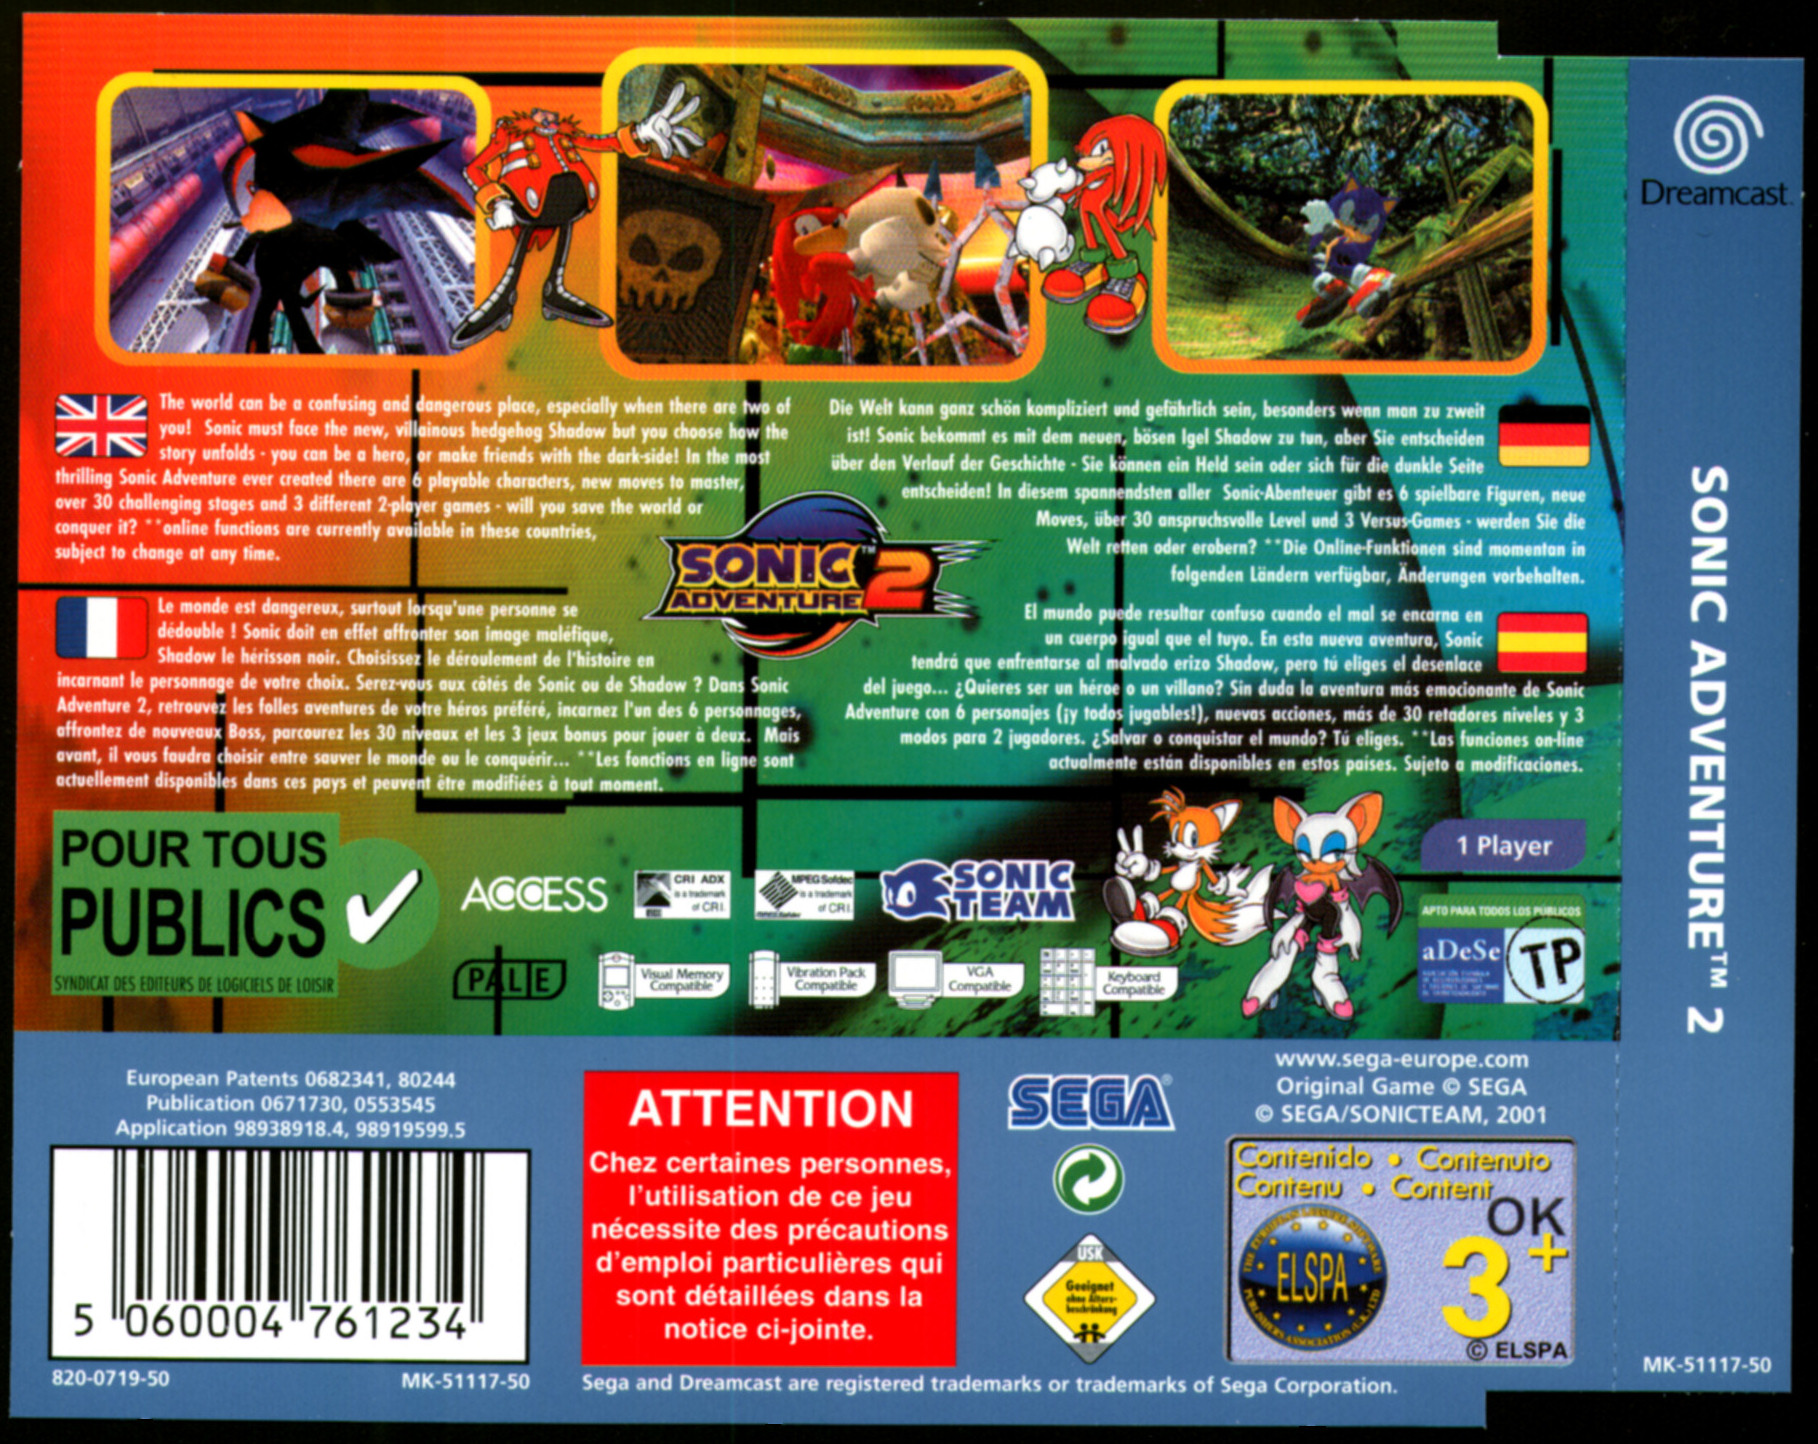 sonic adventure 2 details launchbox games database